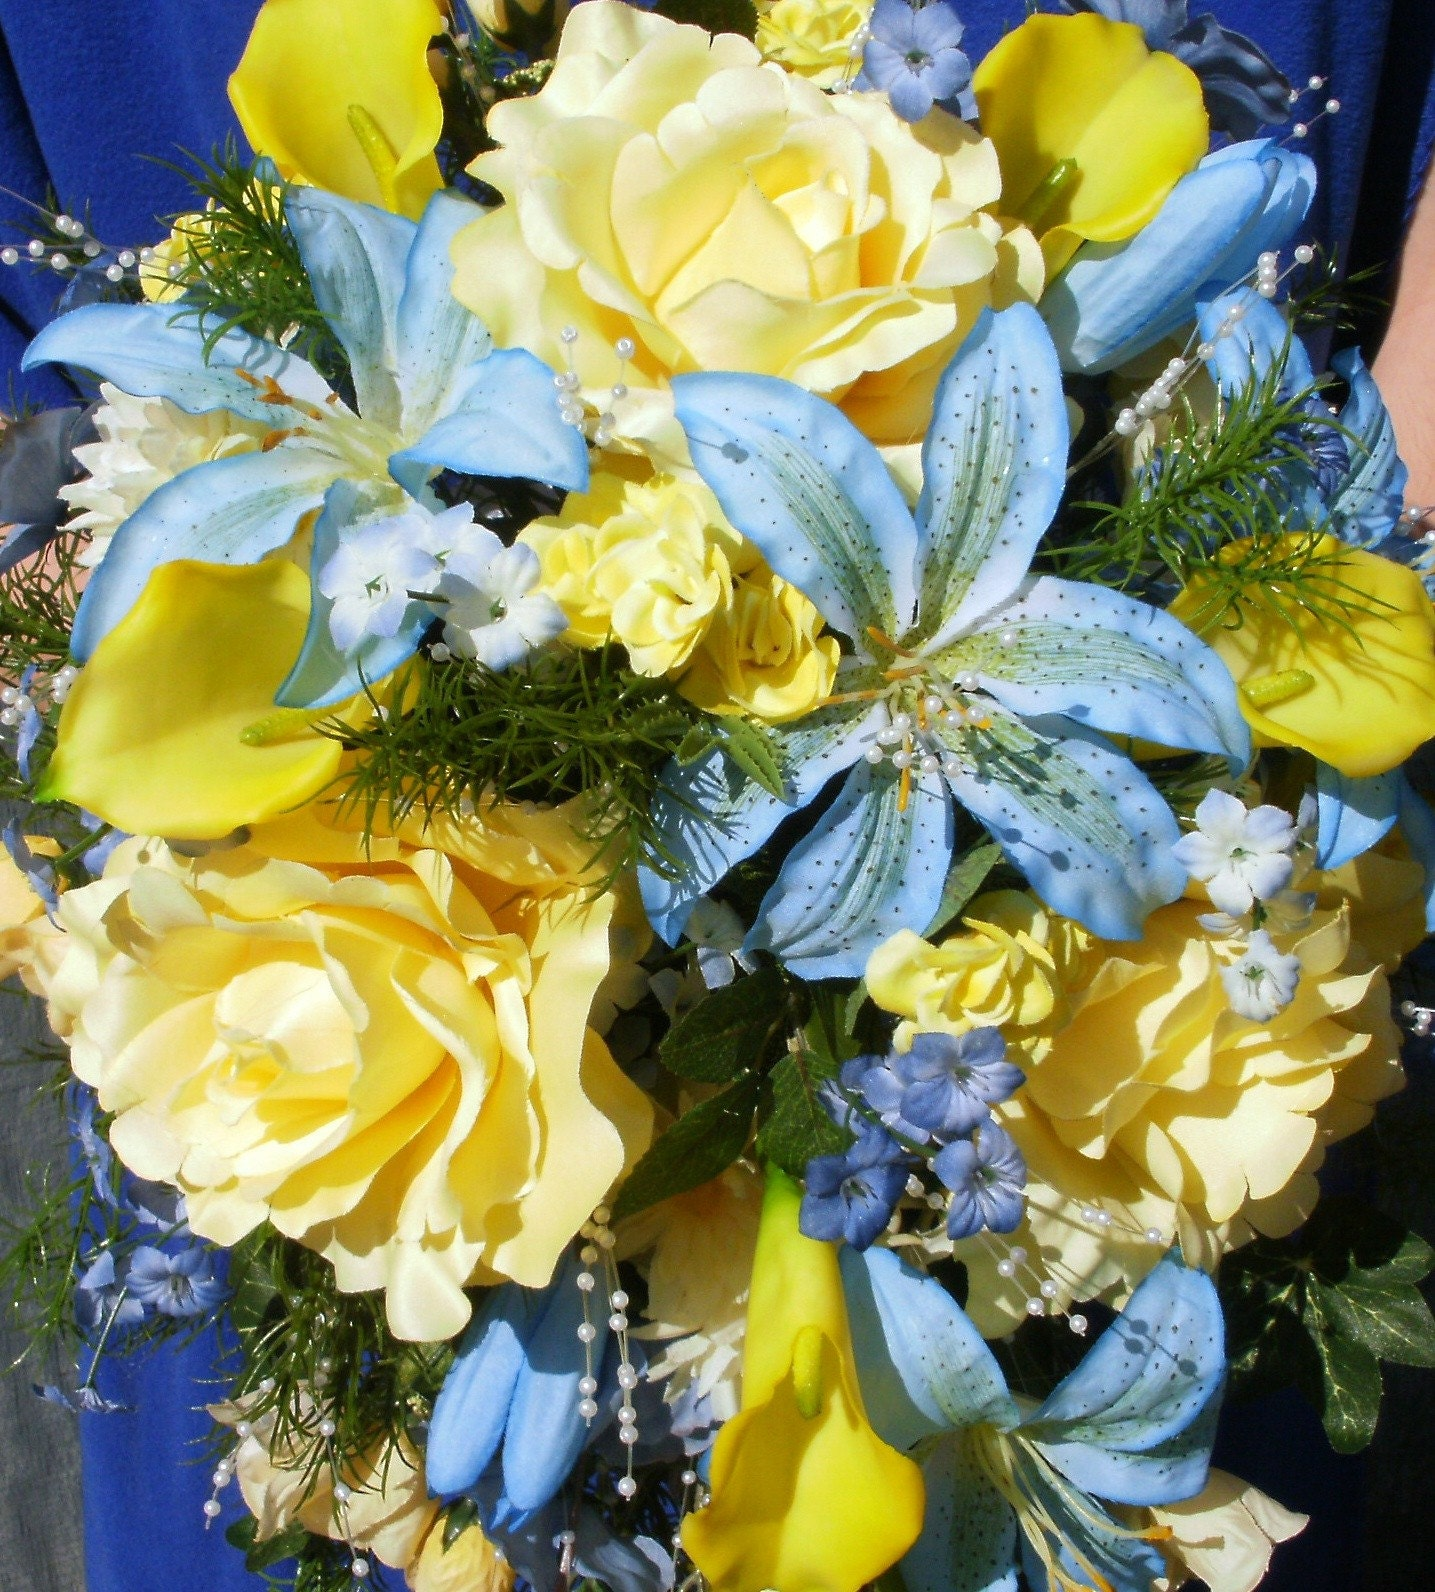 Yellow and blue flowers bouquet marymarfo yellow and blue flowers bouquet izmirmasajfo